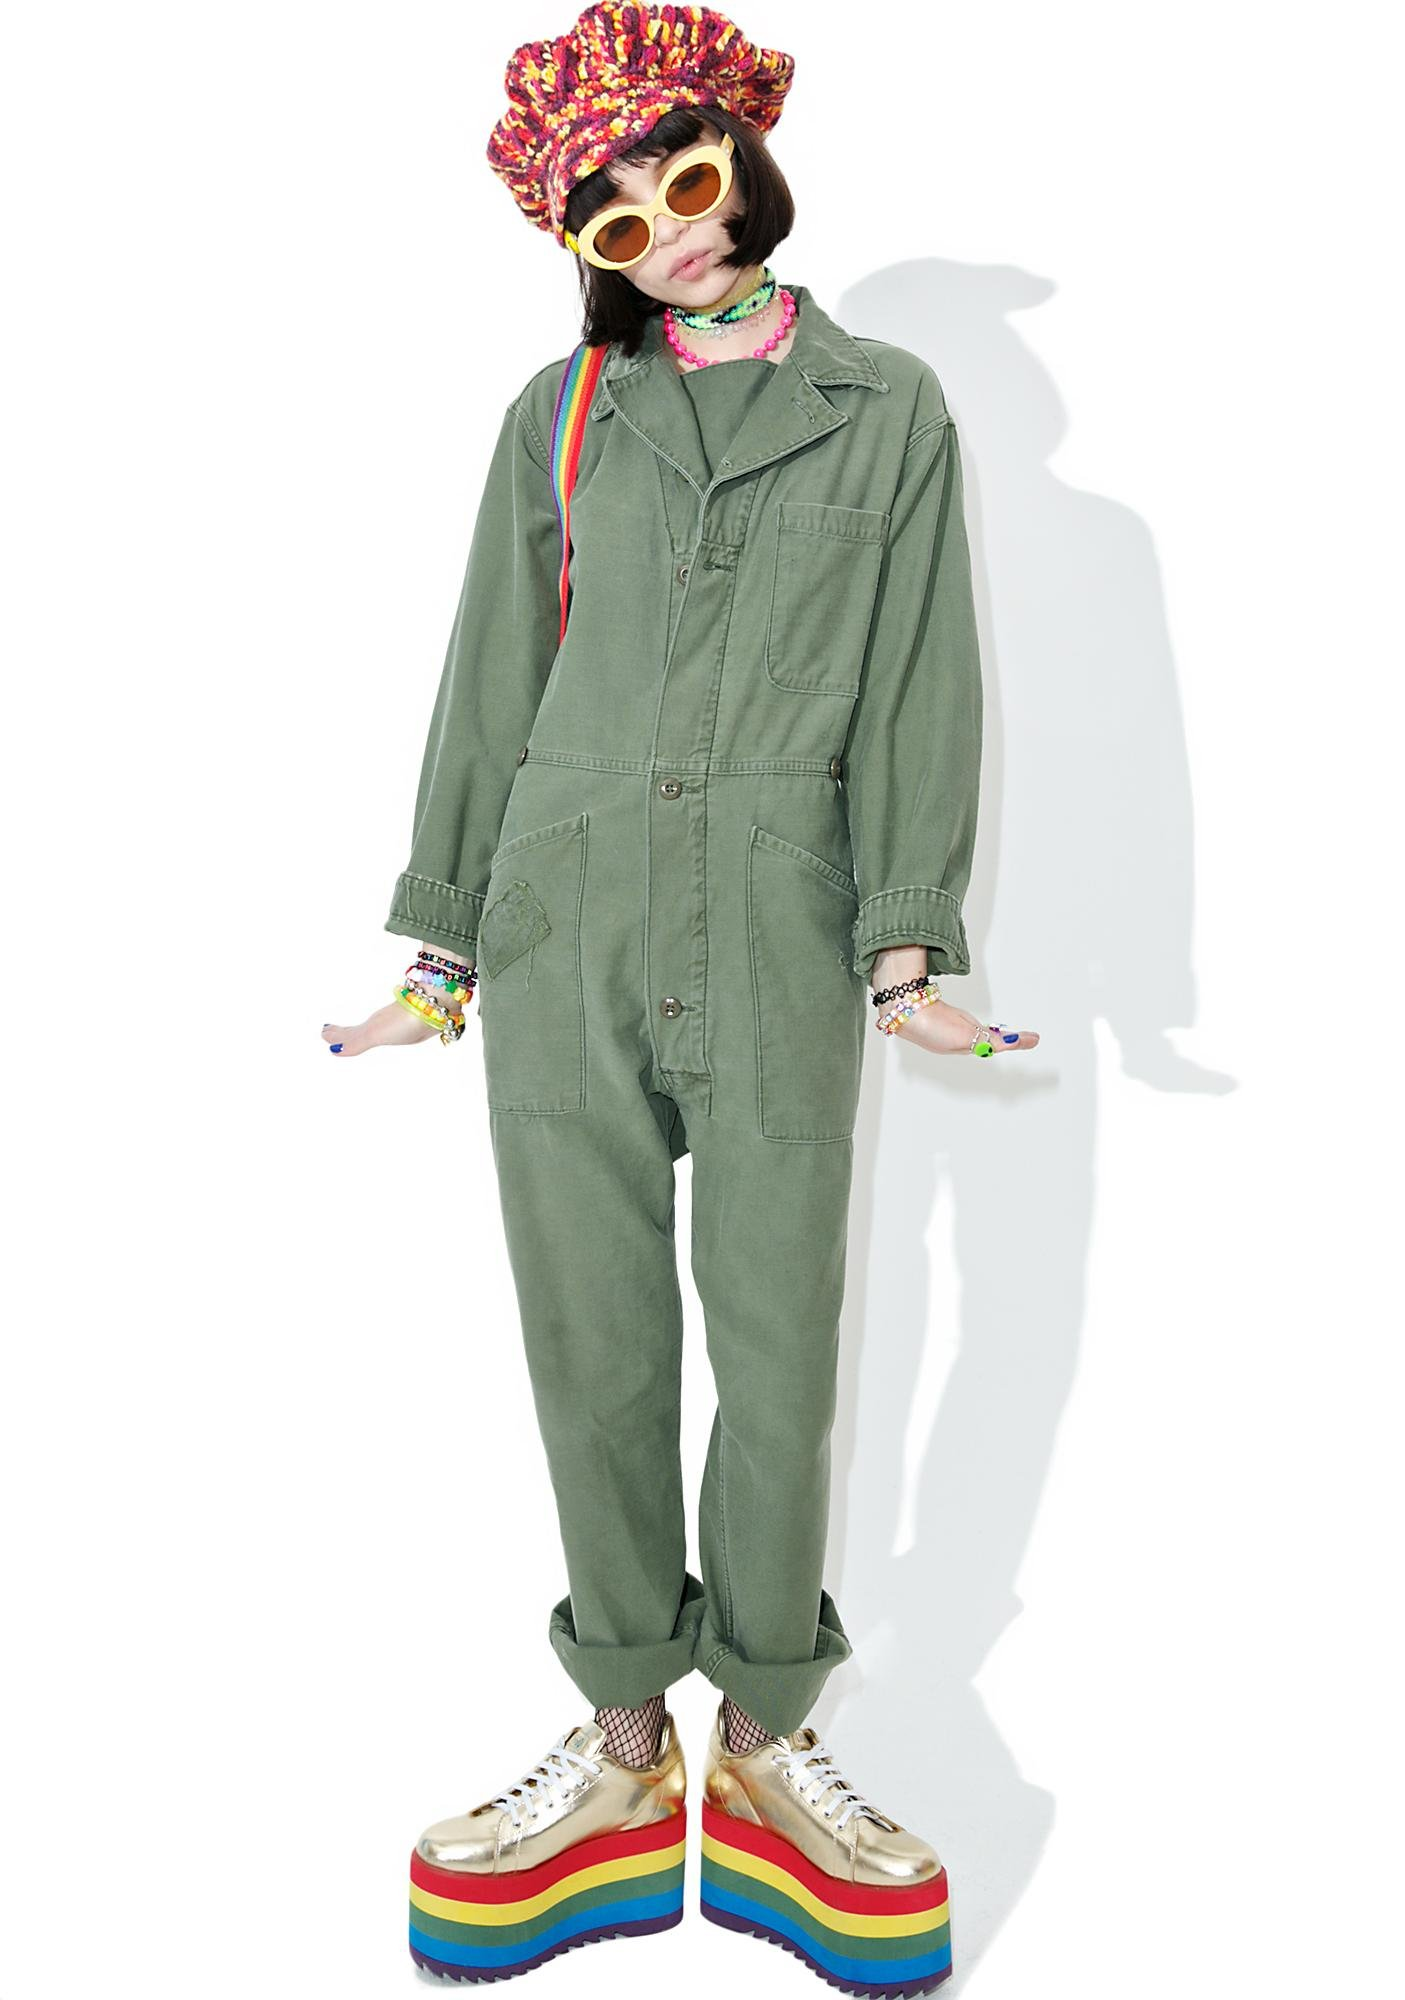 Vintage Army Surplus Patched Flightsuit